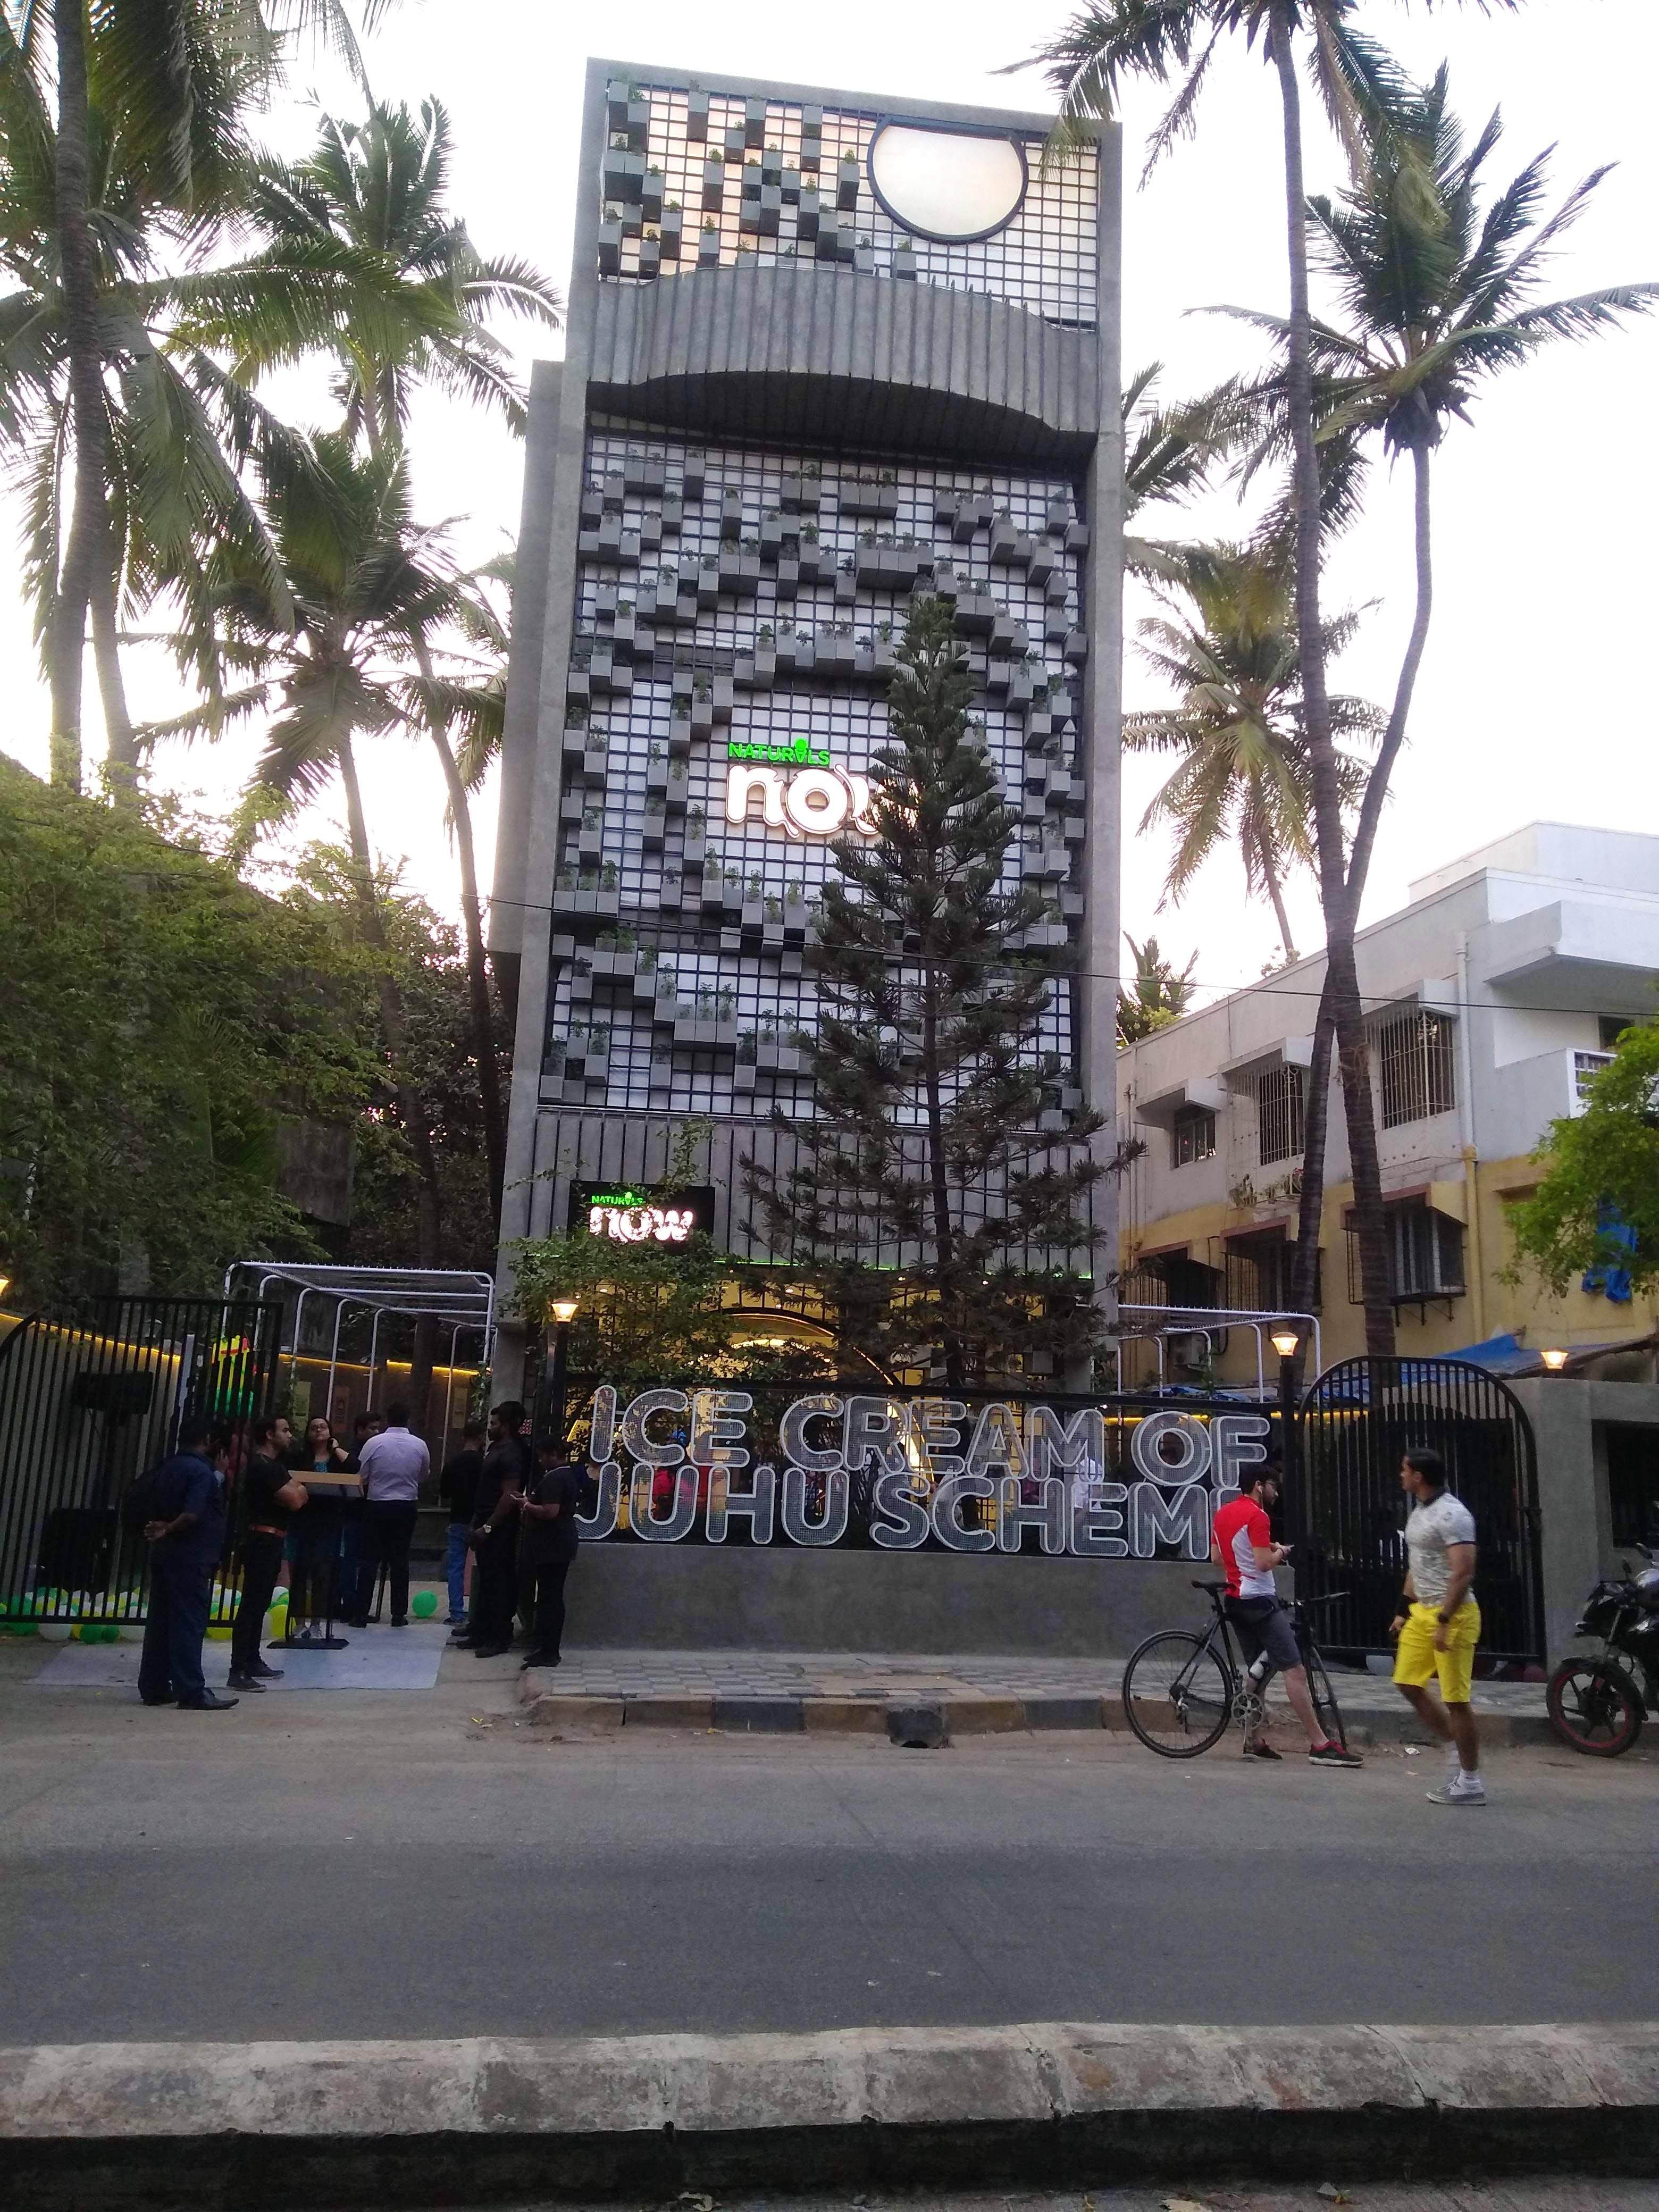 Metropolitan area,Architecture,Urban area,Tree,Building,City,Tower,Facade,Leisure,Street